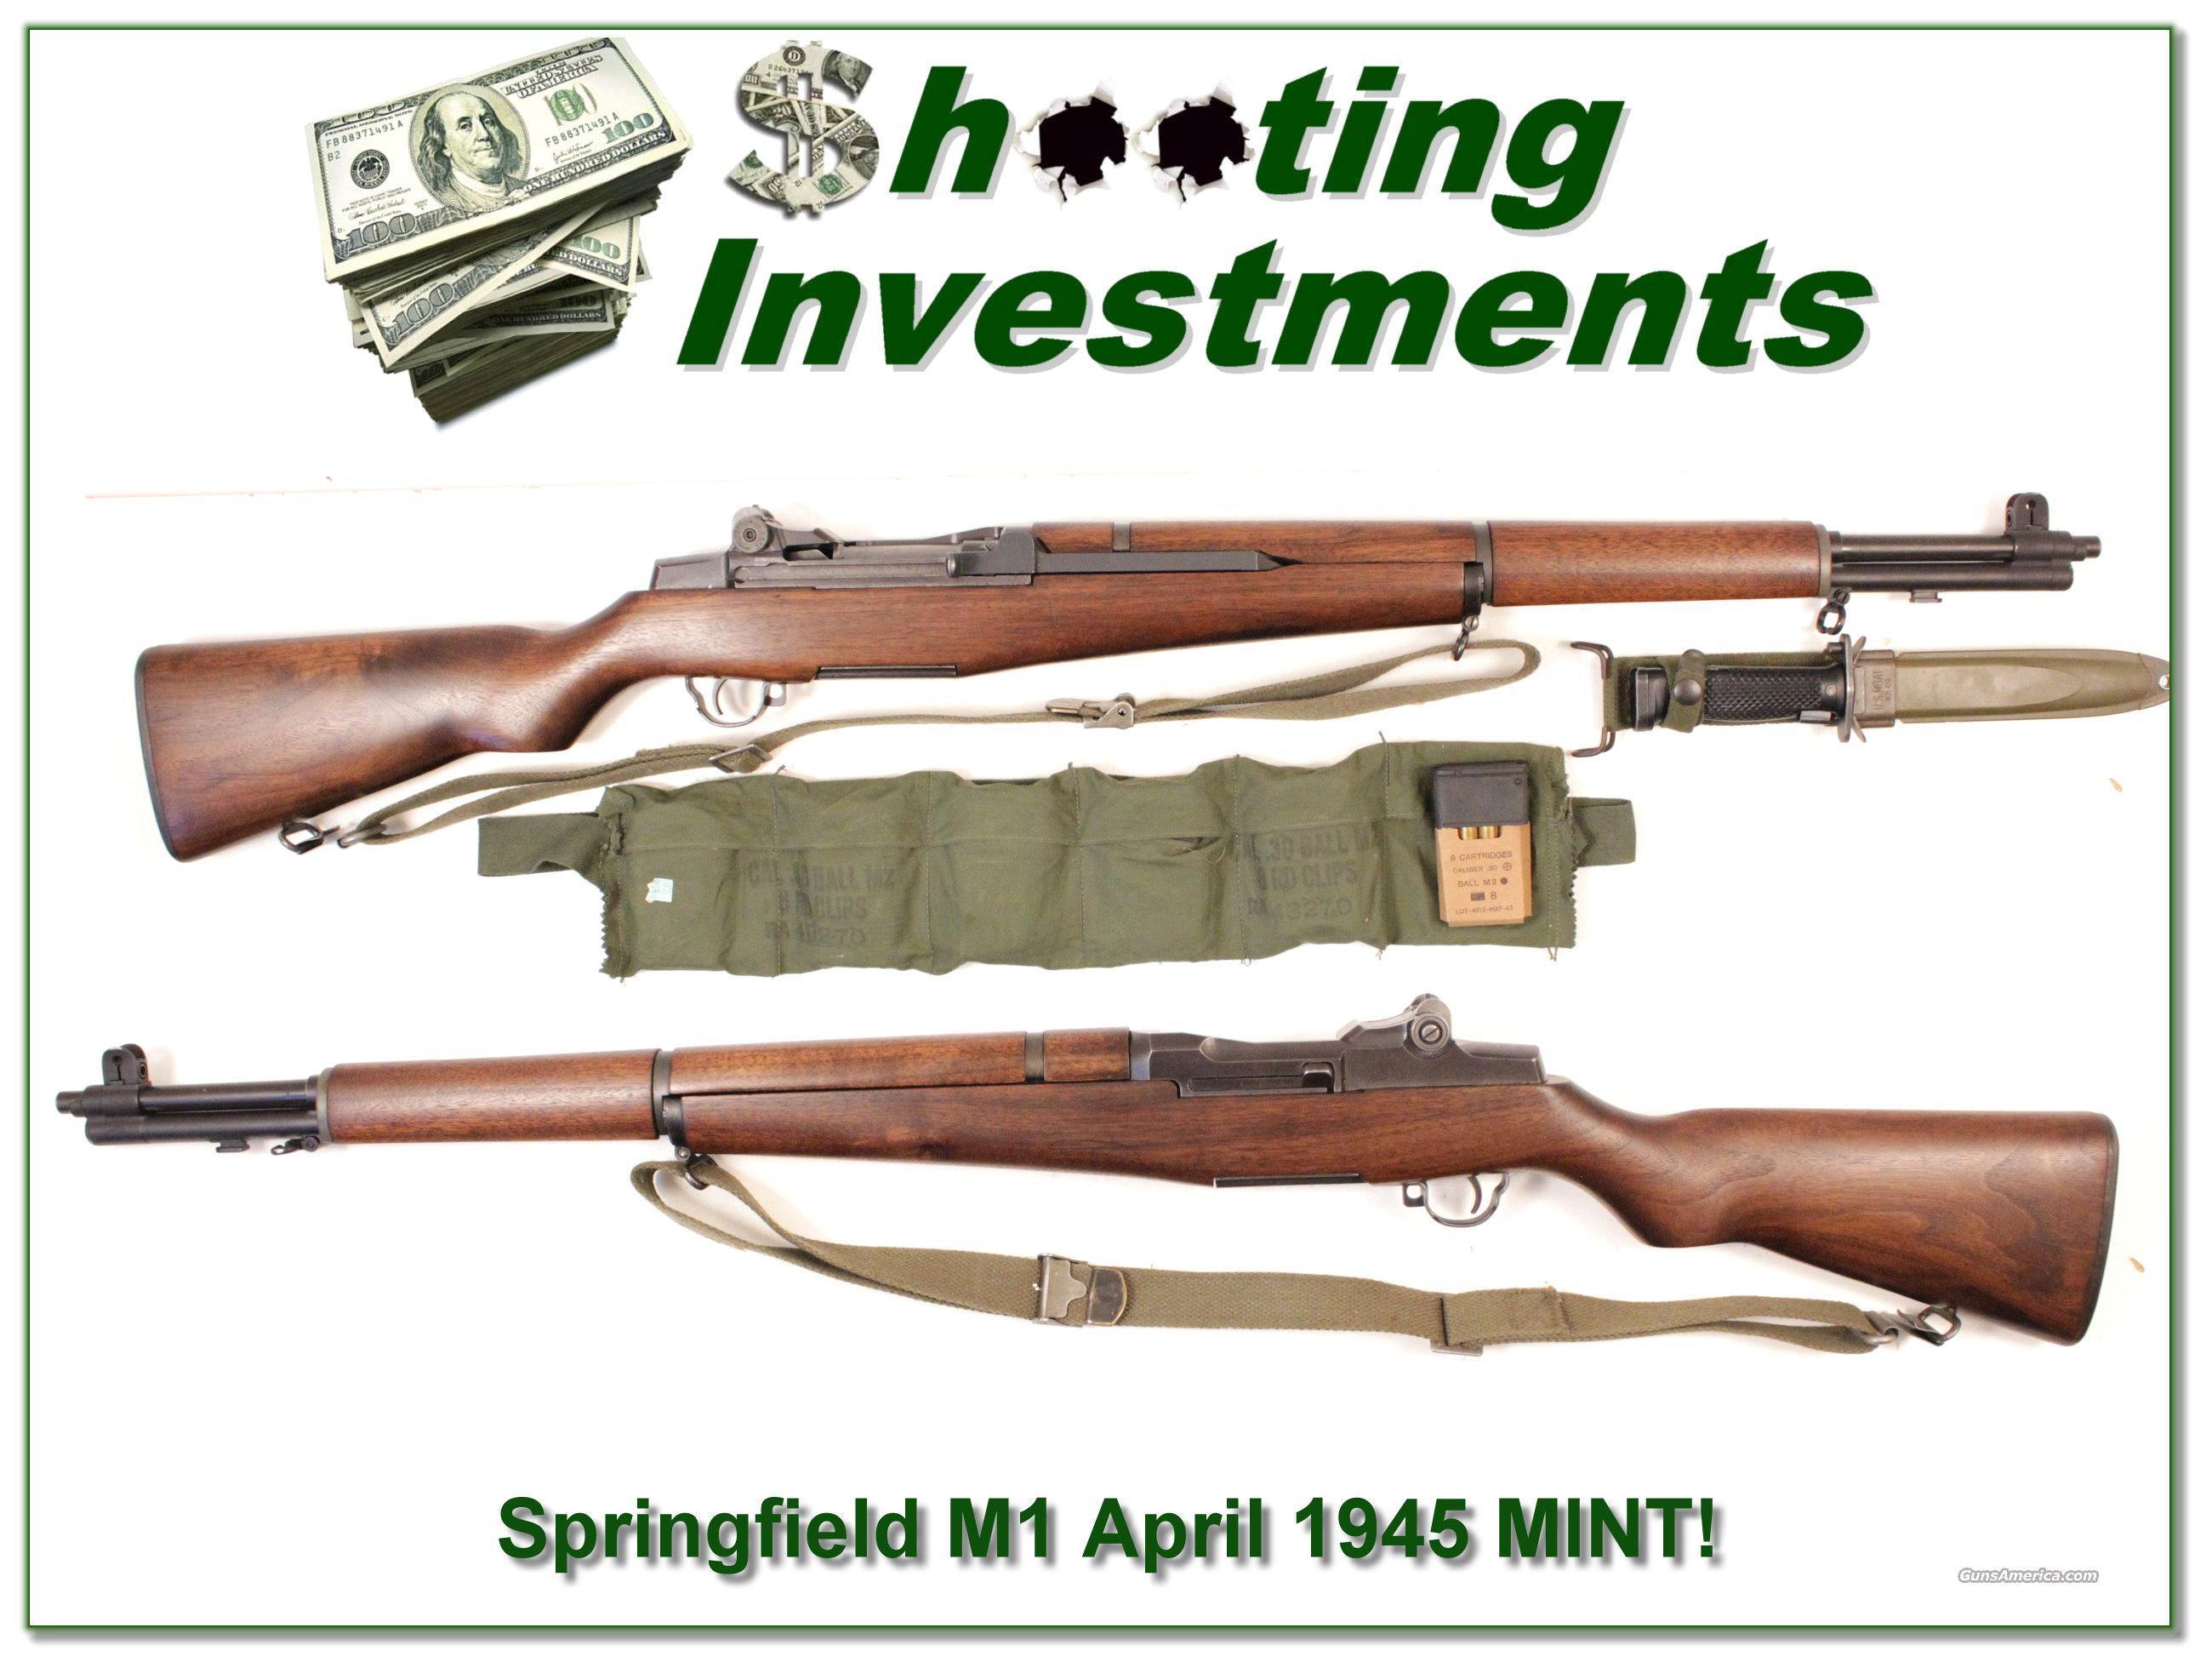 1945 Springfield Armory M1 Garand 30-06 Collector Condition!